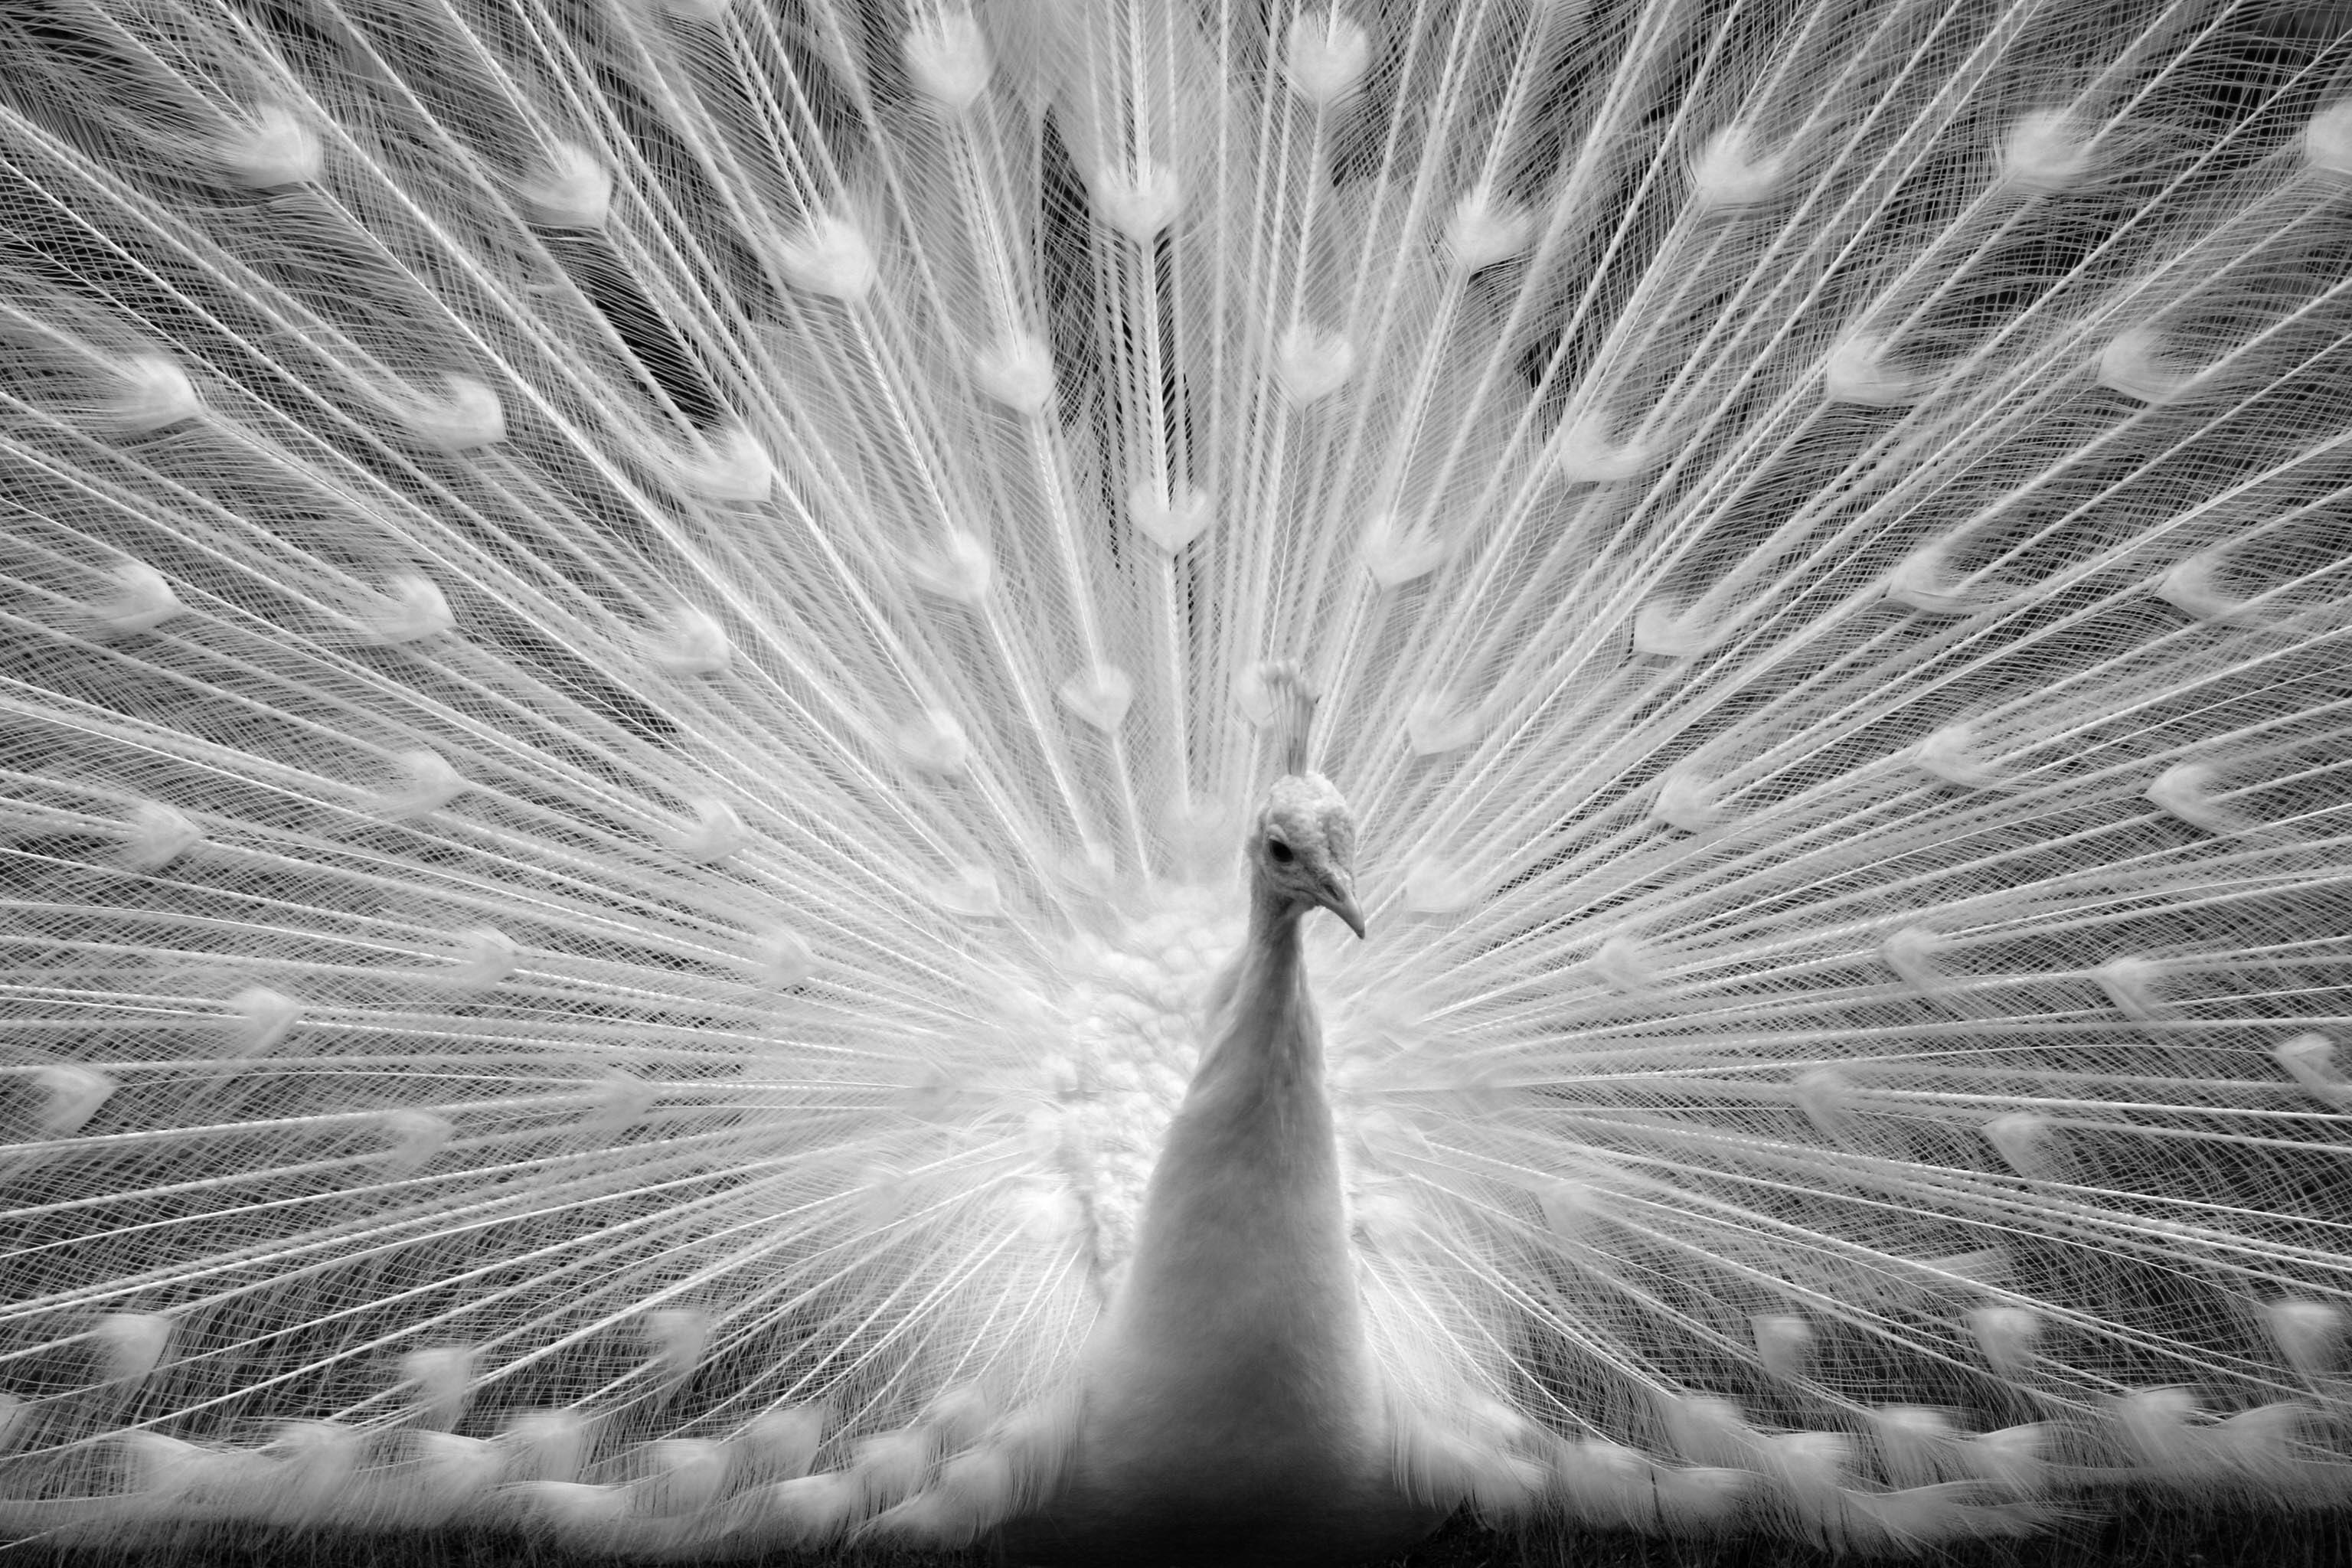 A Beautiful Peacock Life As A Human